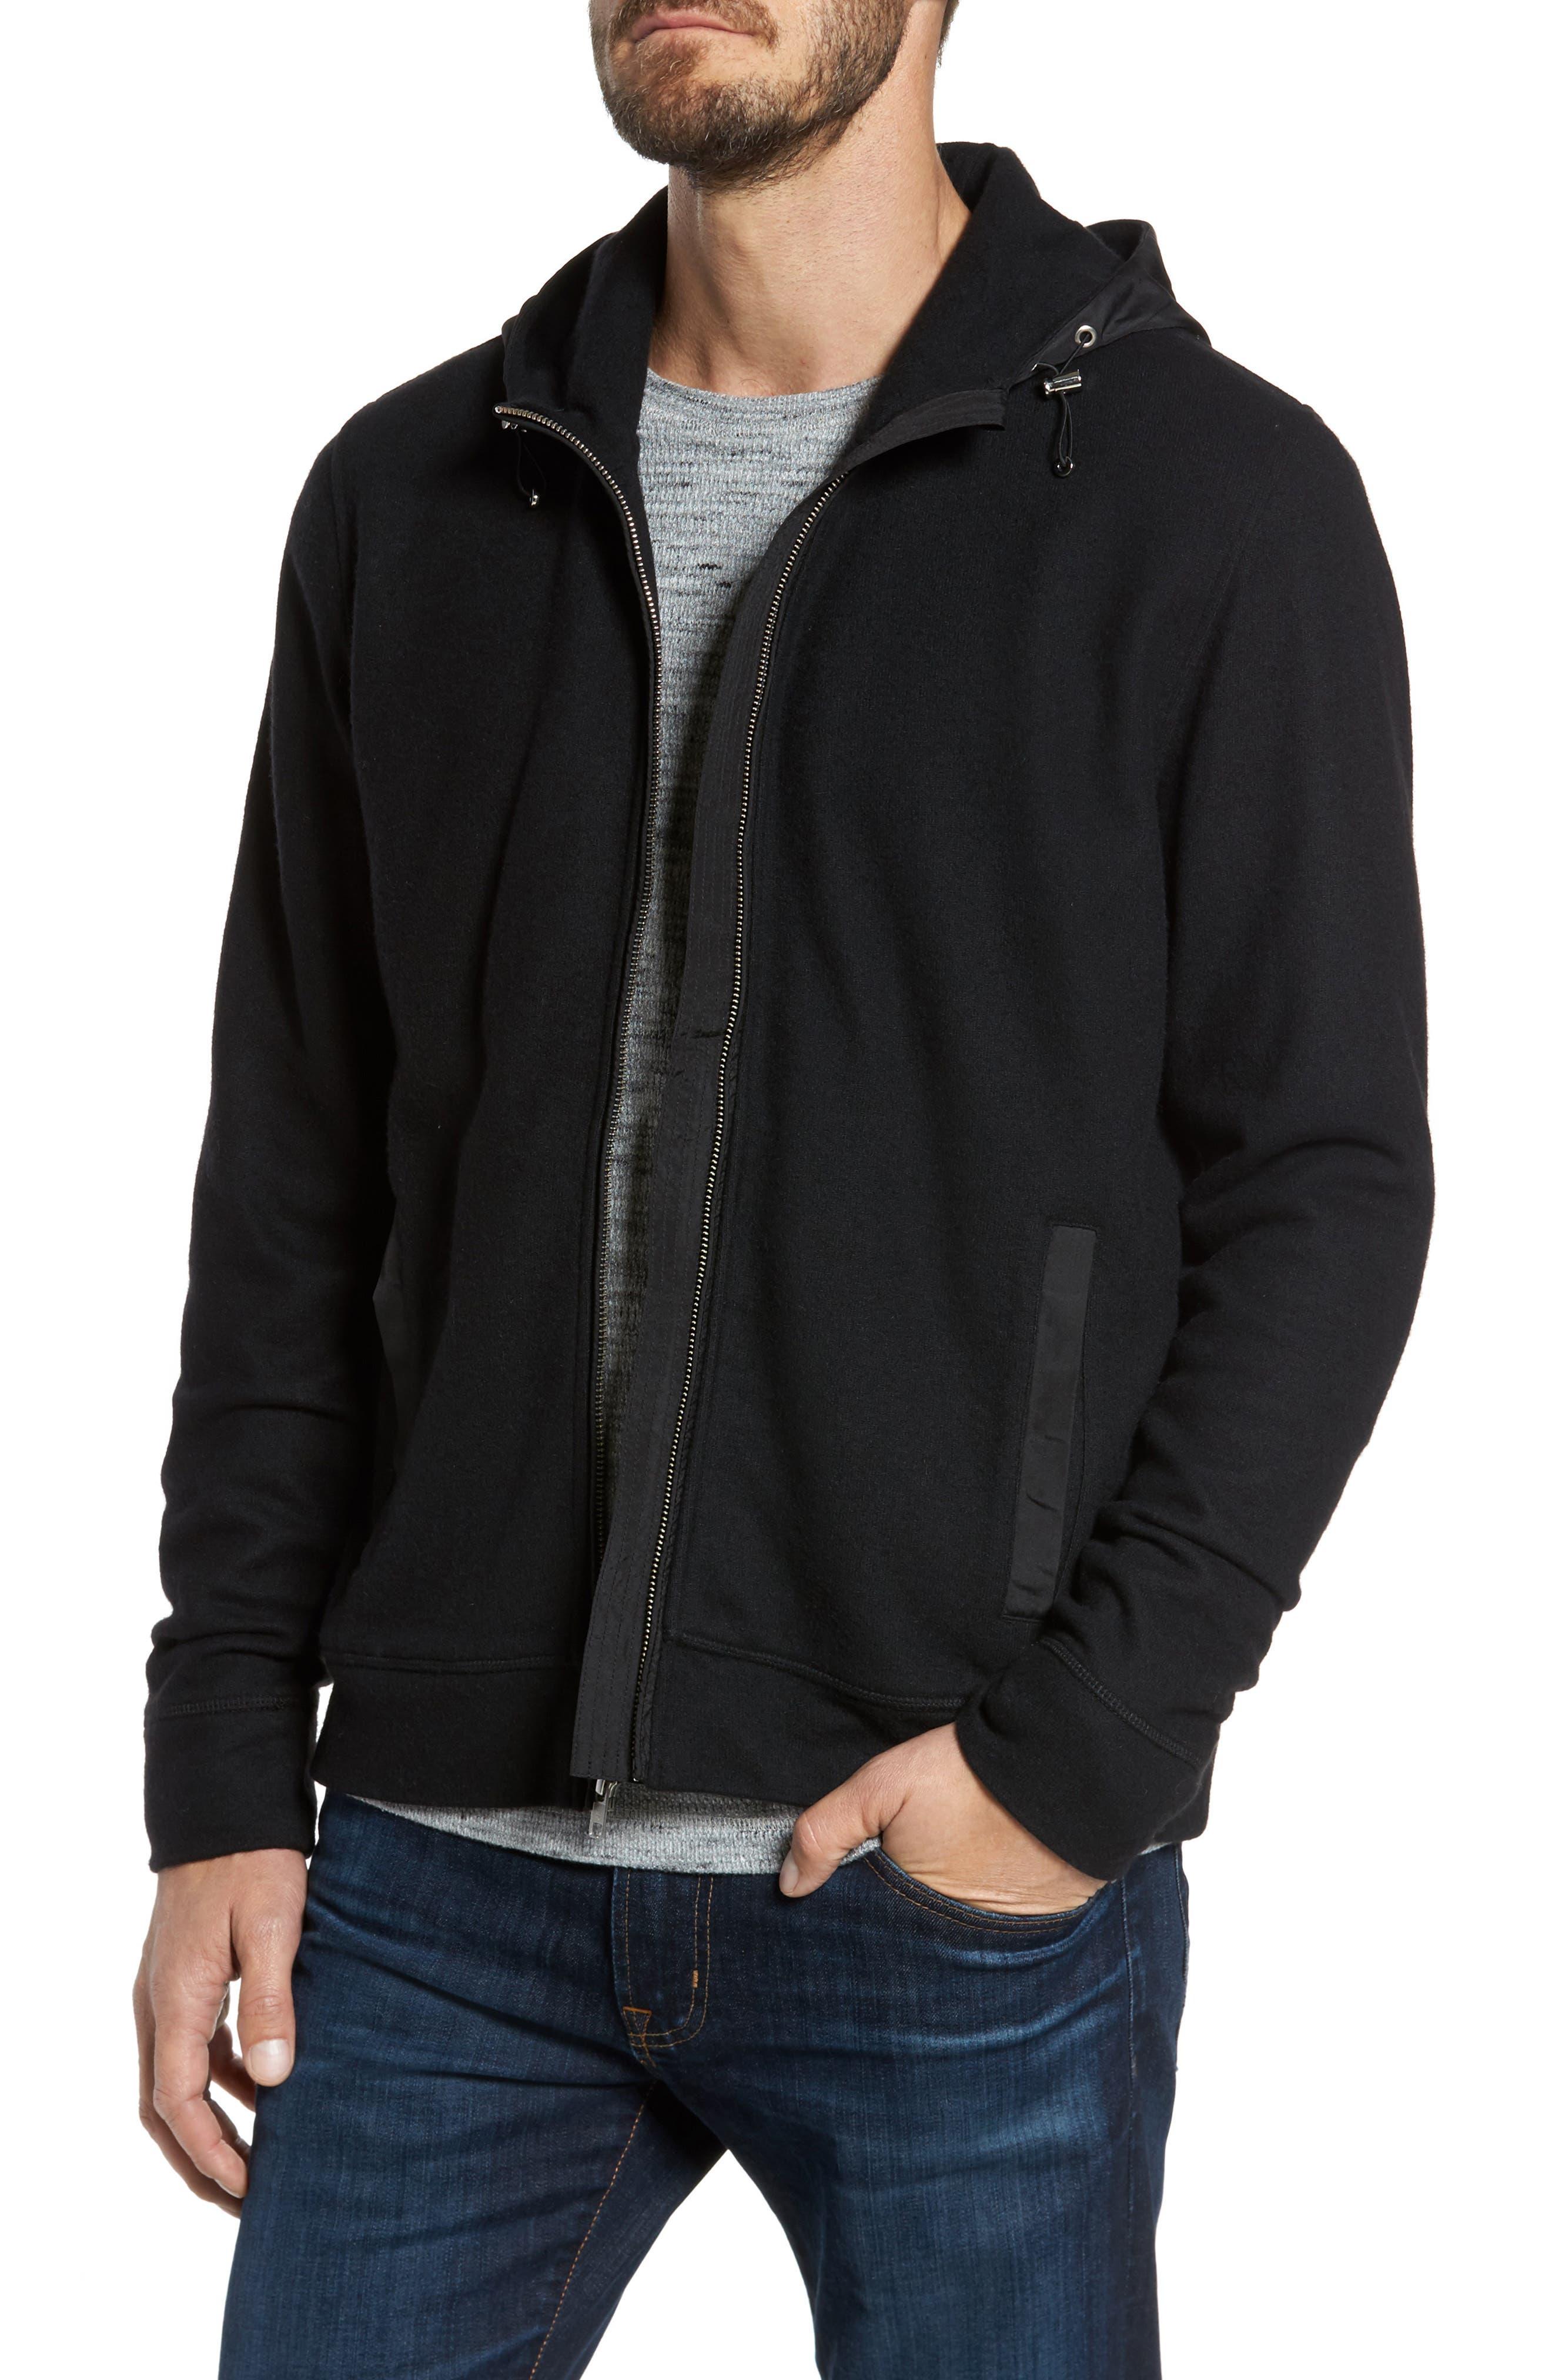 Nordstrom Men's Shop Wool Blend Hooded Cardigan